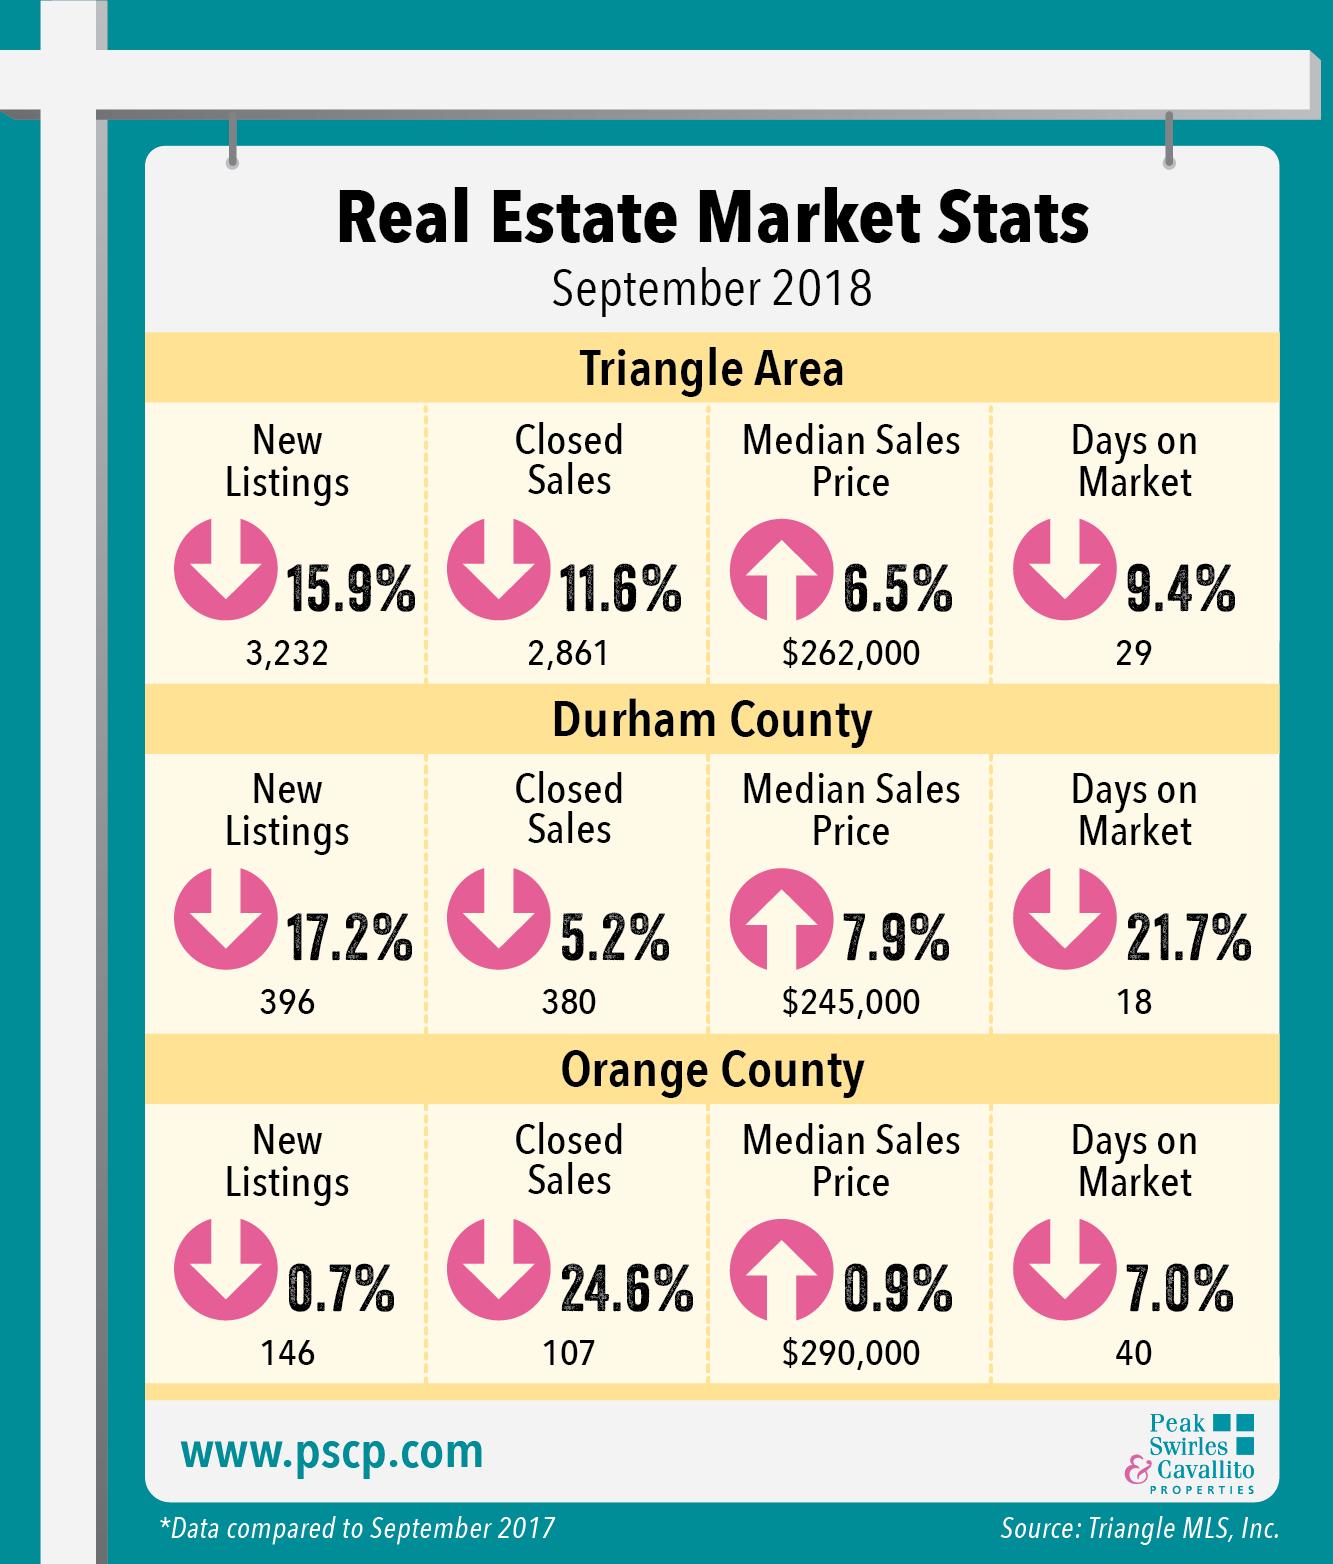 September 2018 Market Indicators